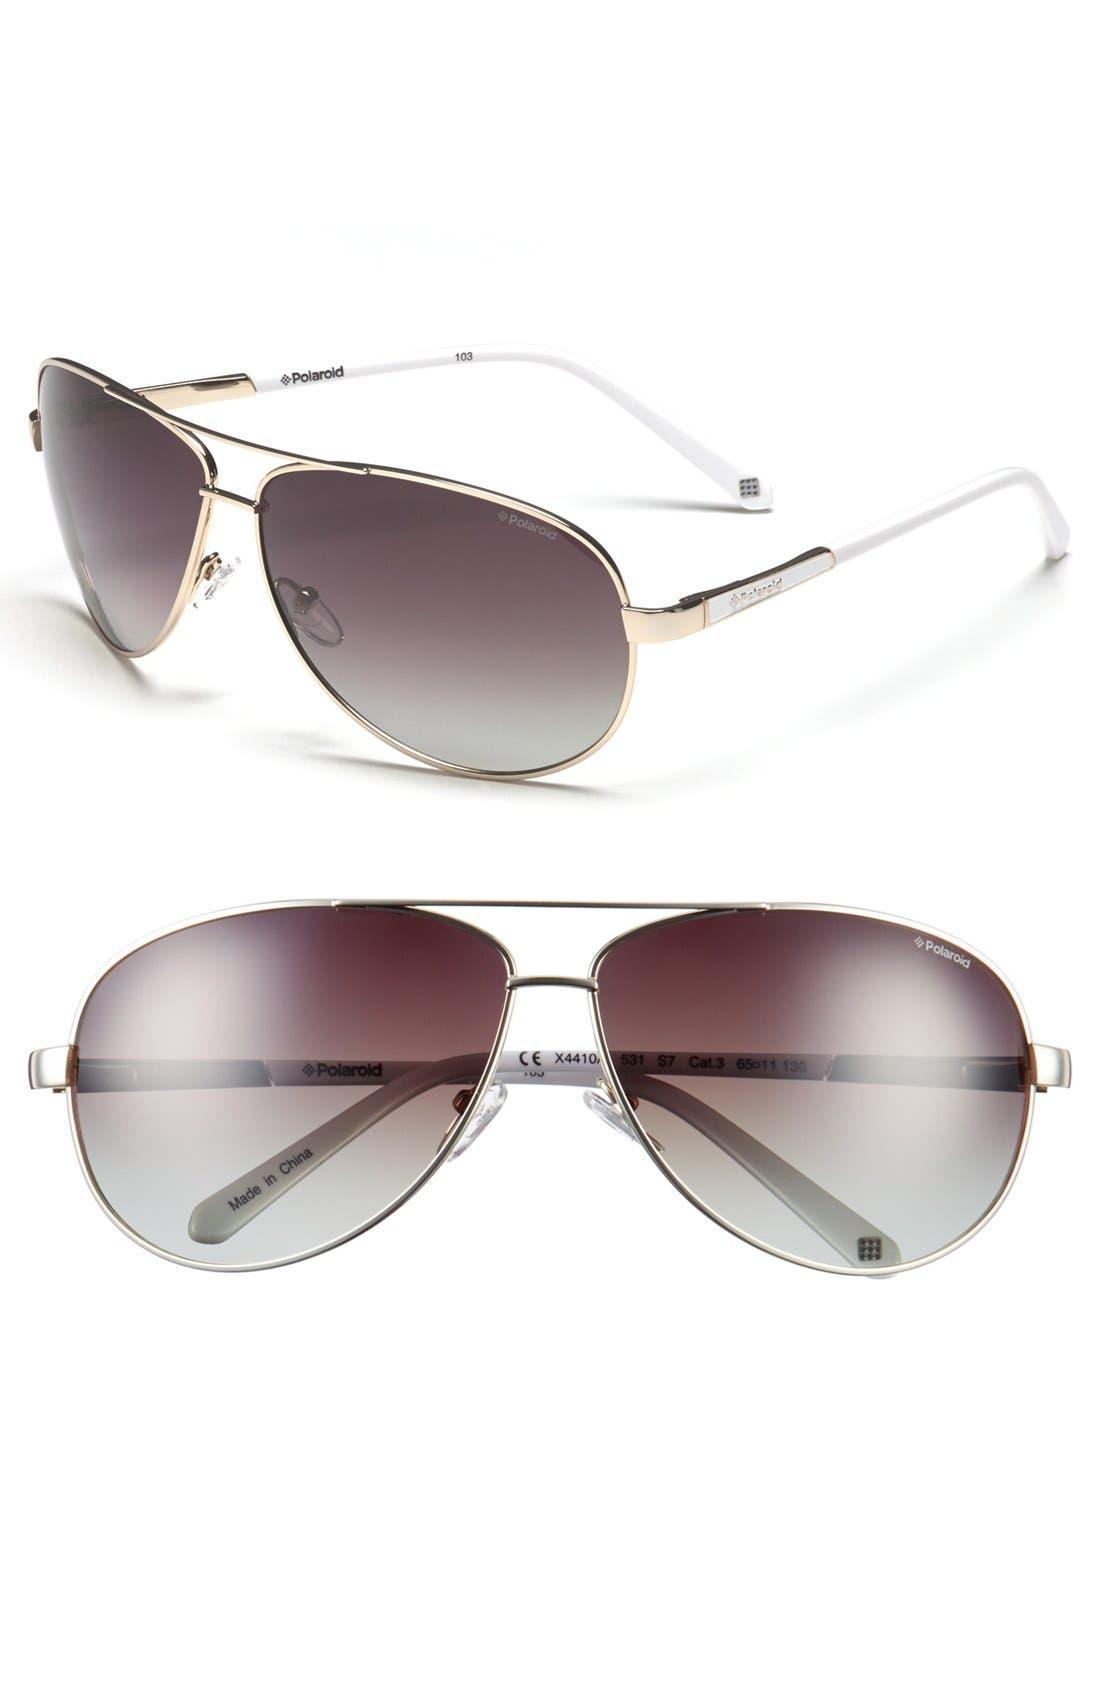 Main Image - Polaroid Eyewear 65mm Polarized Aviator Sunglasses